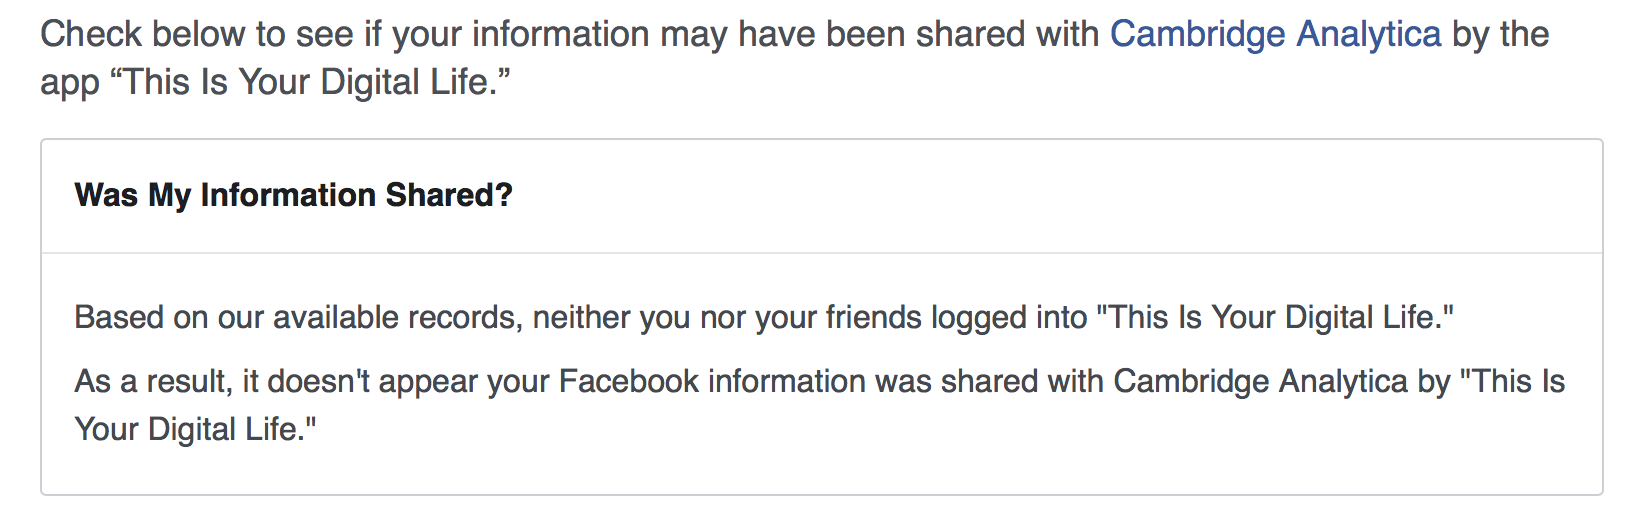 facebook cambridge analytica were you affected